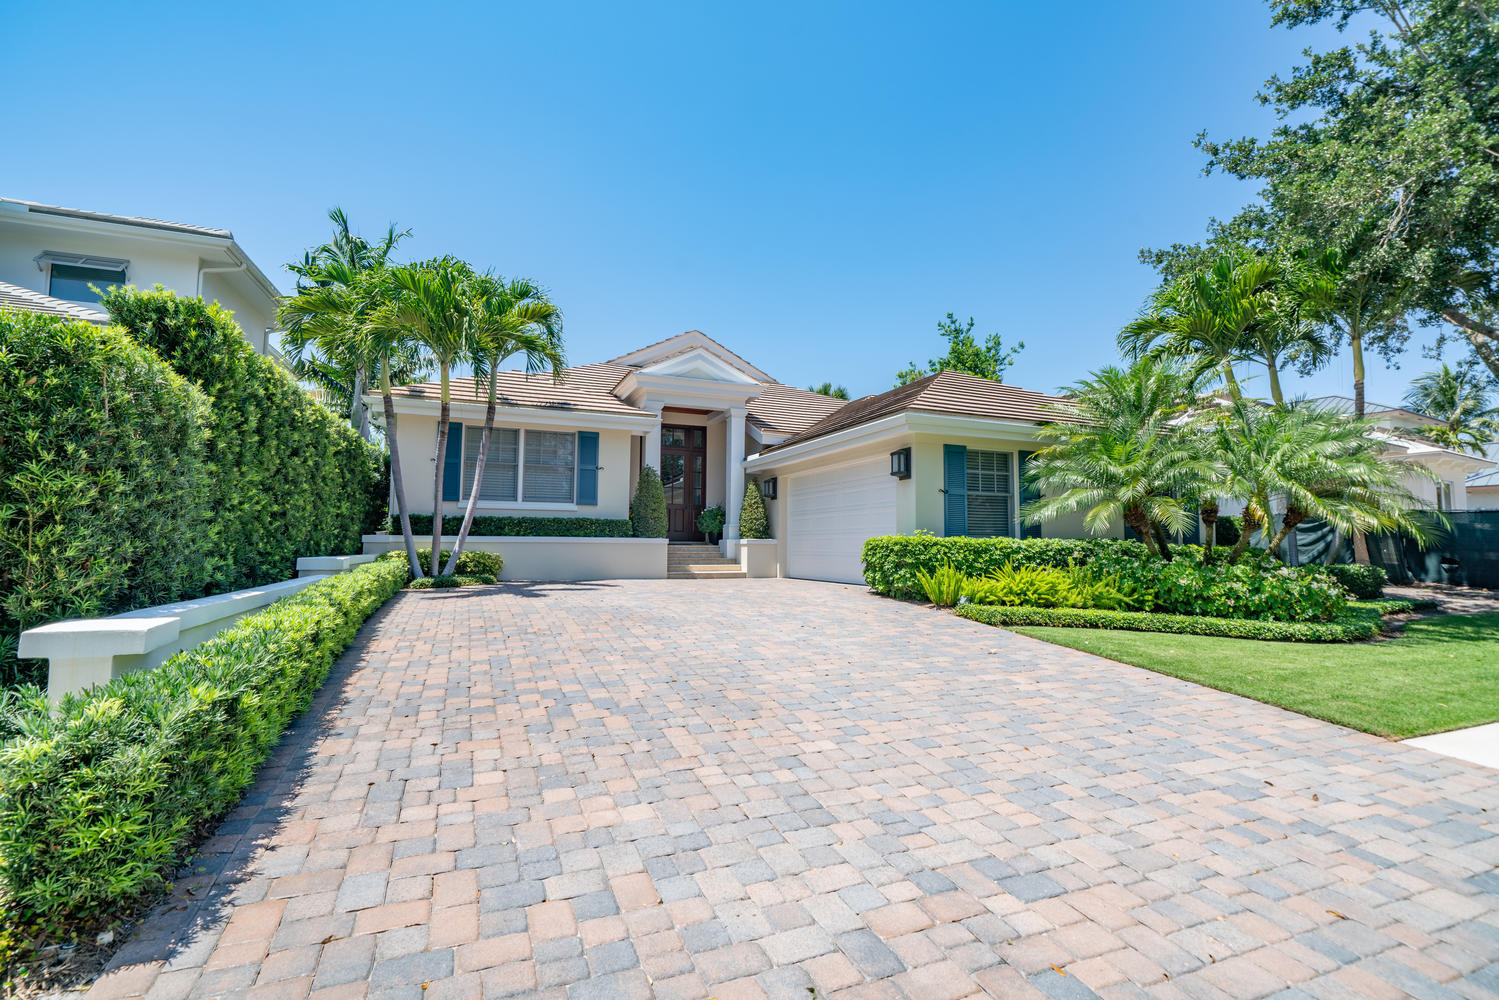 113 Terrapin Trail, Jupiter, Florida 33458, 2 Bedrooms Bedrooms, ,3 BathroomsBathrooms,A,Single family,Terrapin,RX-10532292